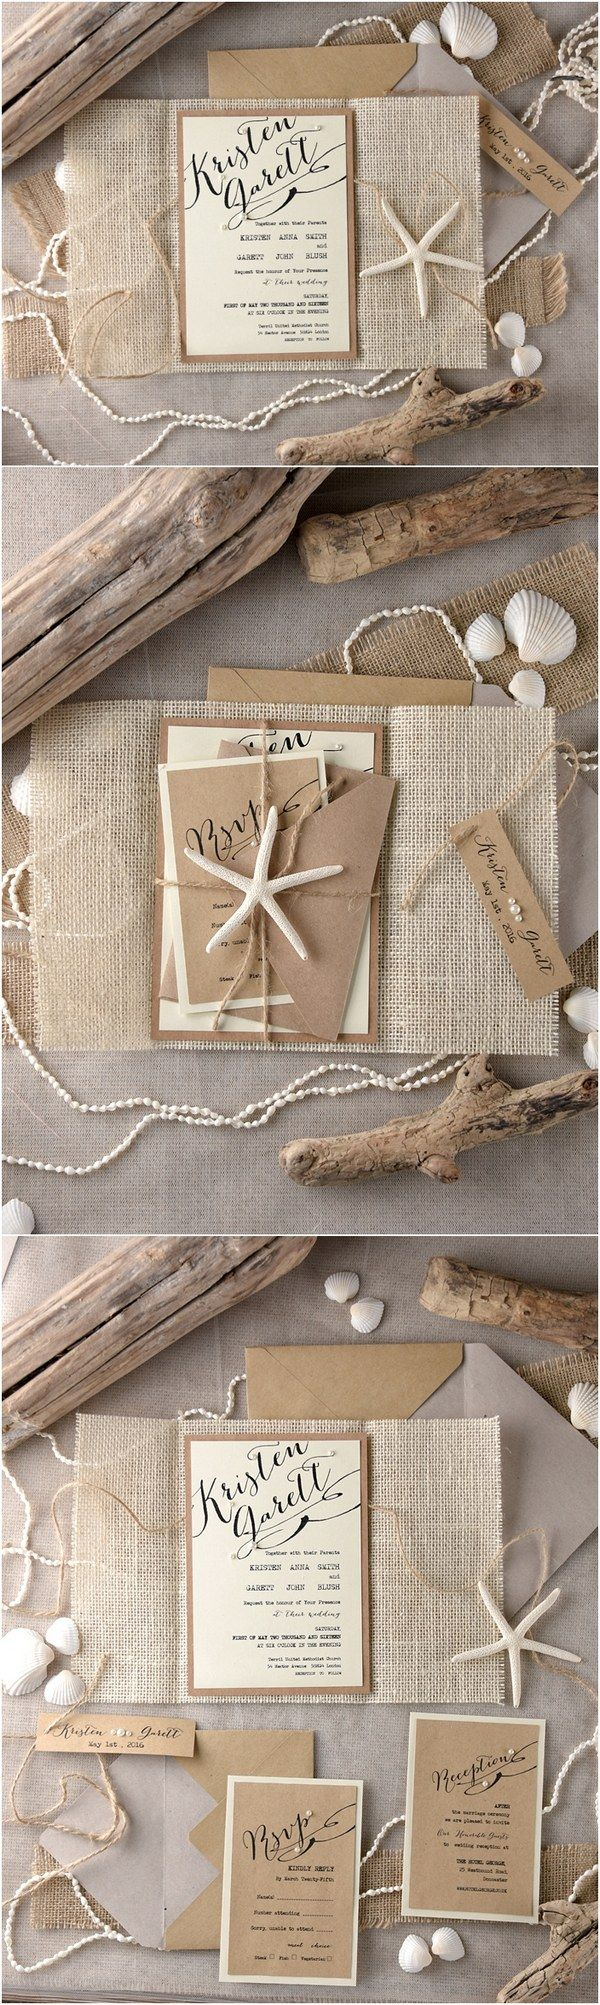 Rustic country burlap beach wedding invitations @4LOVEPolkaDots ...